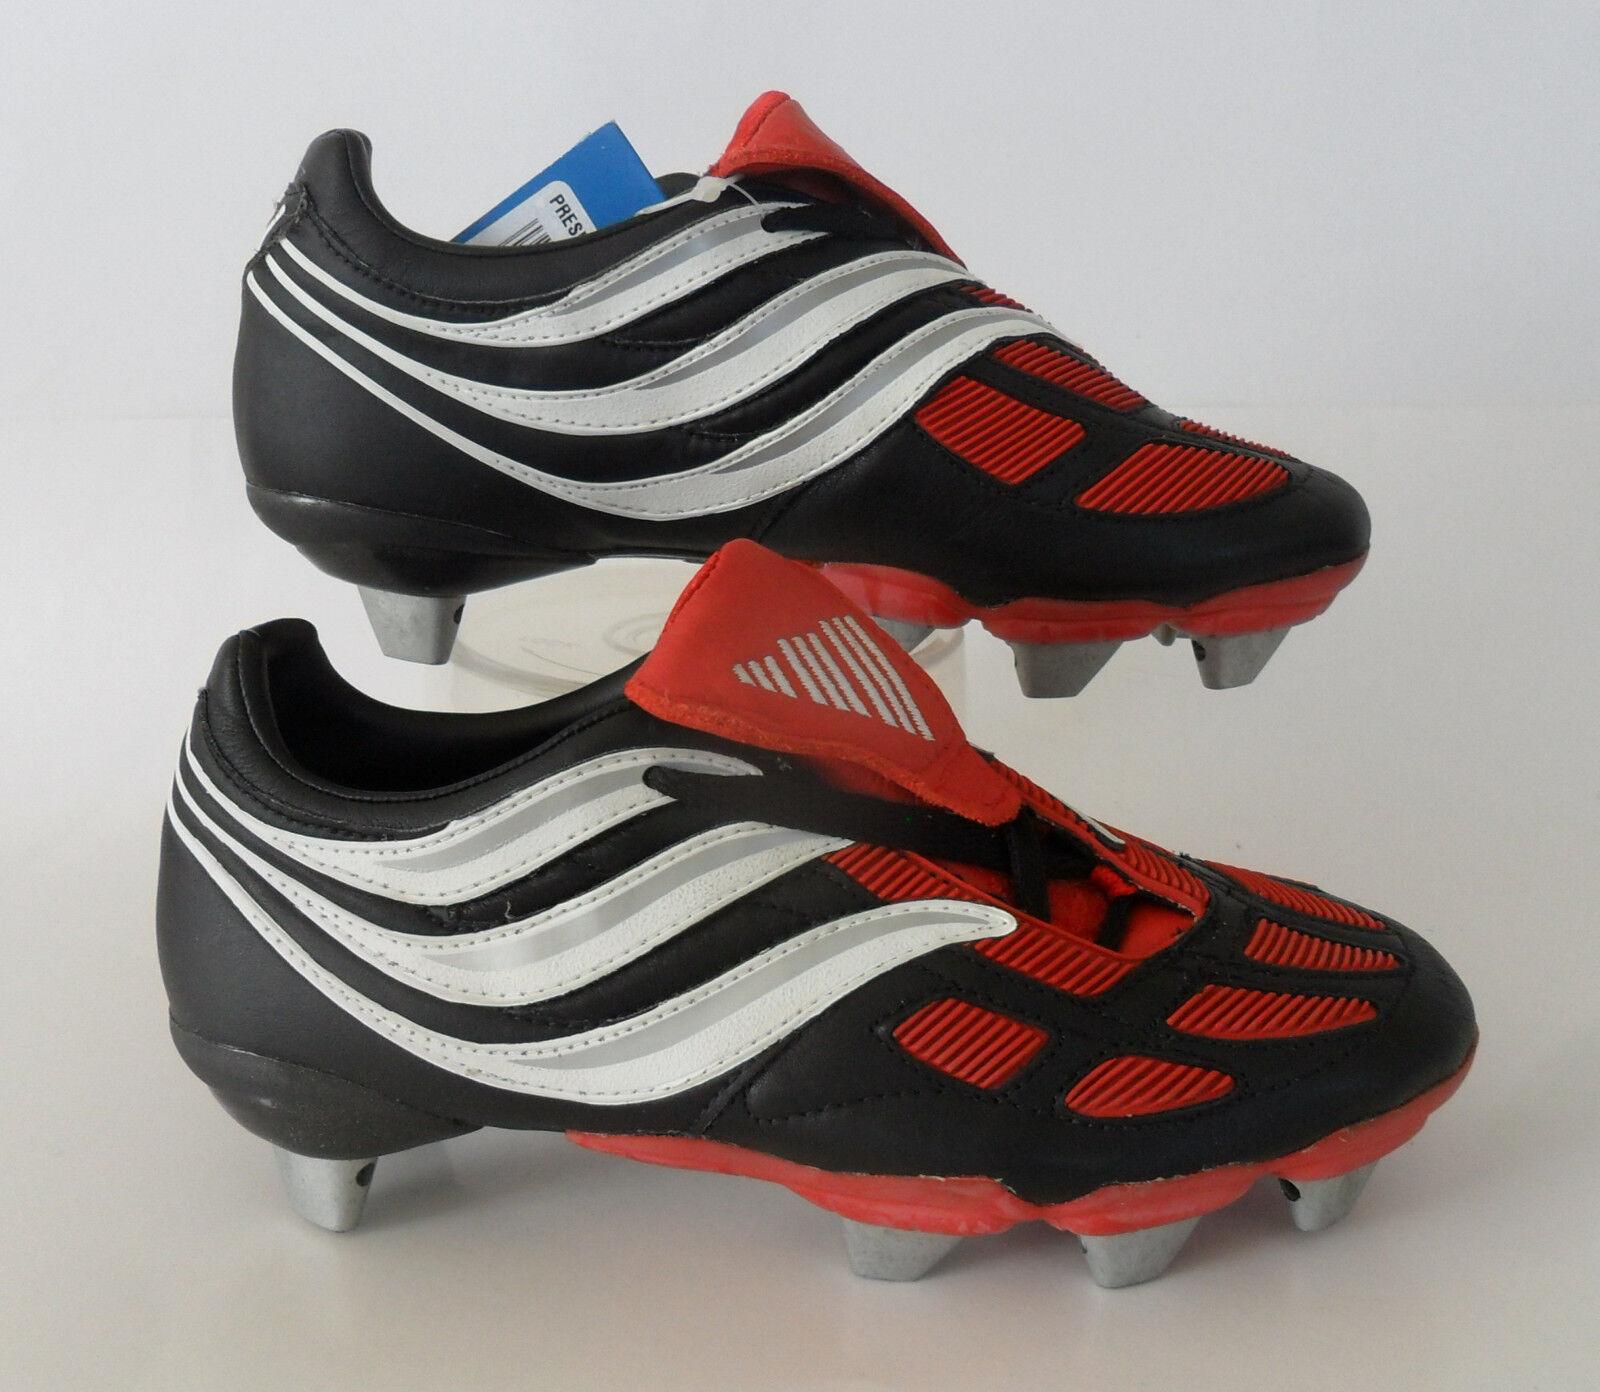 rare adidas football boots